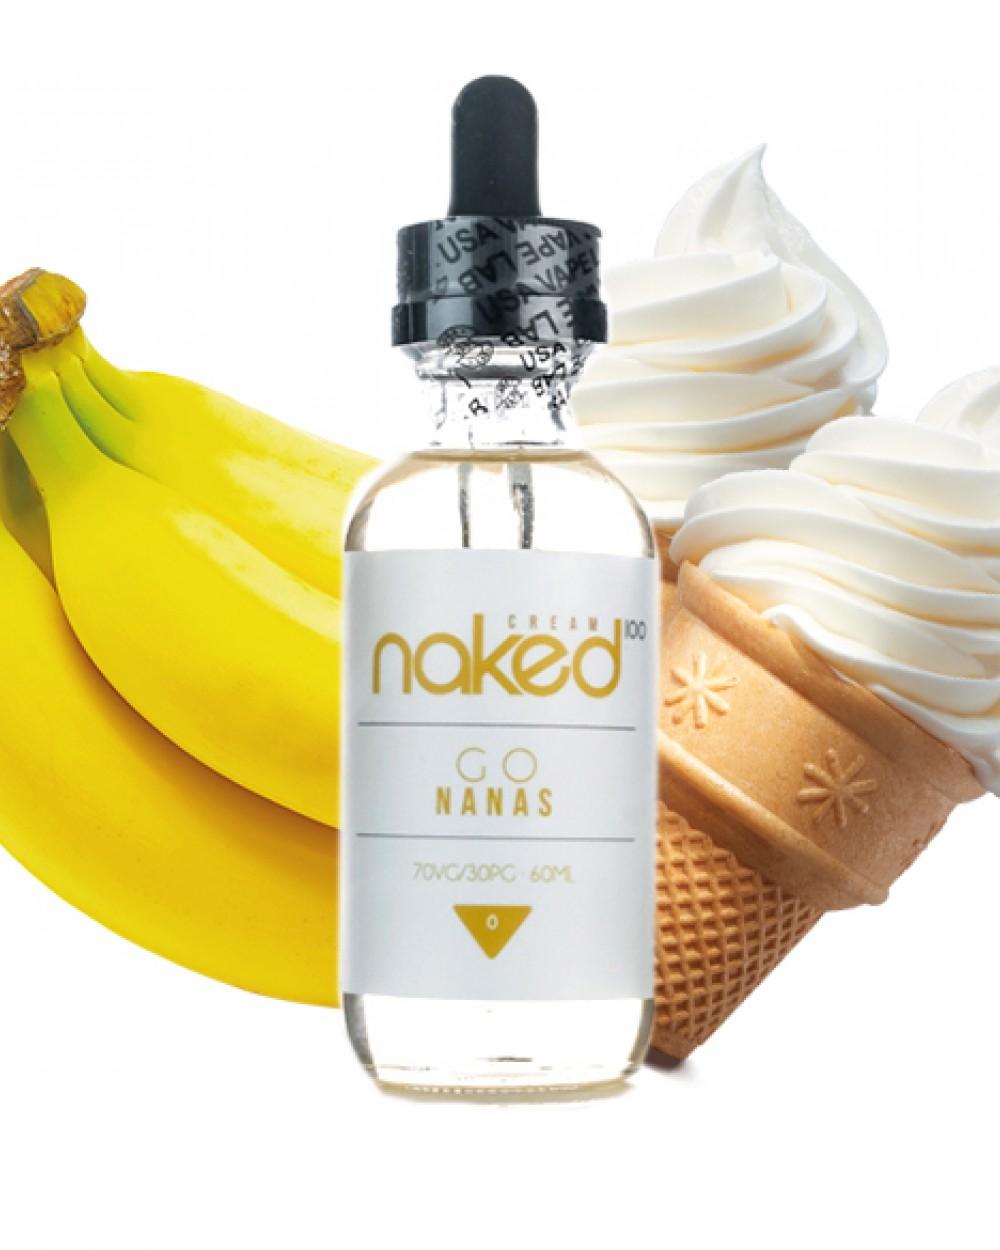 Banana (Go Nanas) - Naked 100 Cream E Liquid | Vape Juice